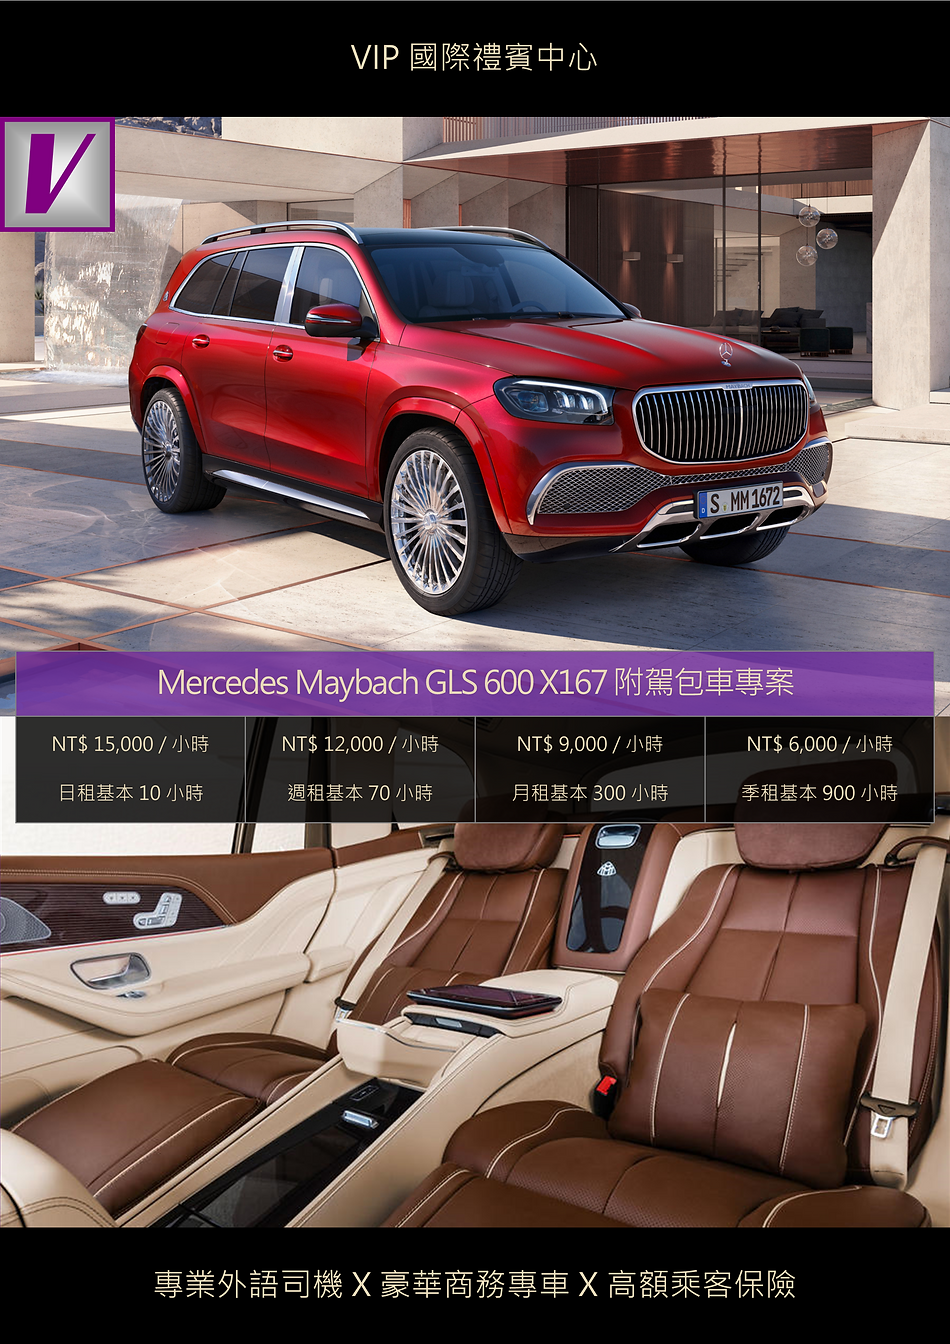 VIP國際禮賓中心 MERCEDES MAYBACH GLS 600 X167 附駕包車專案 DM.png